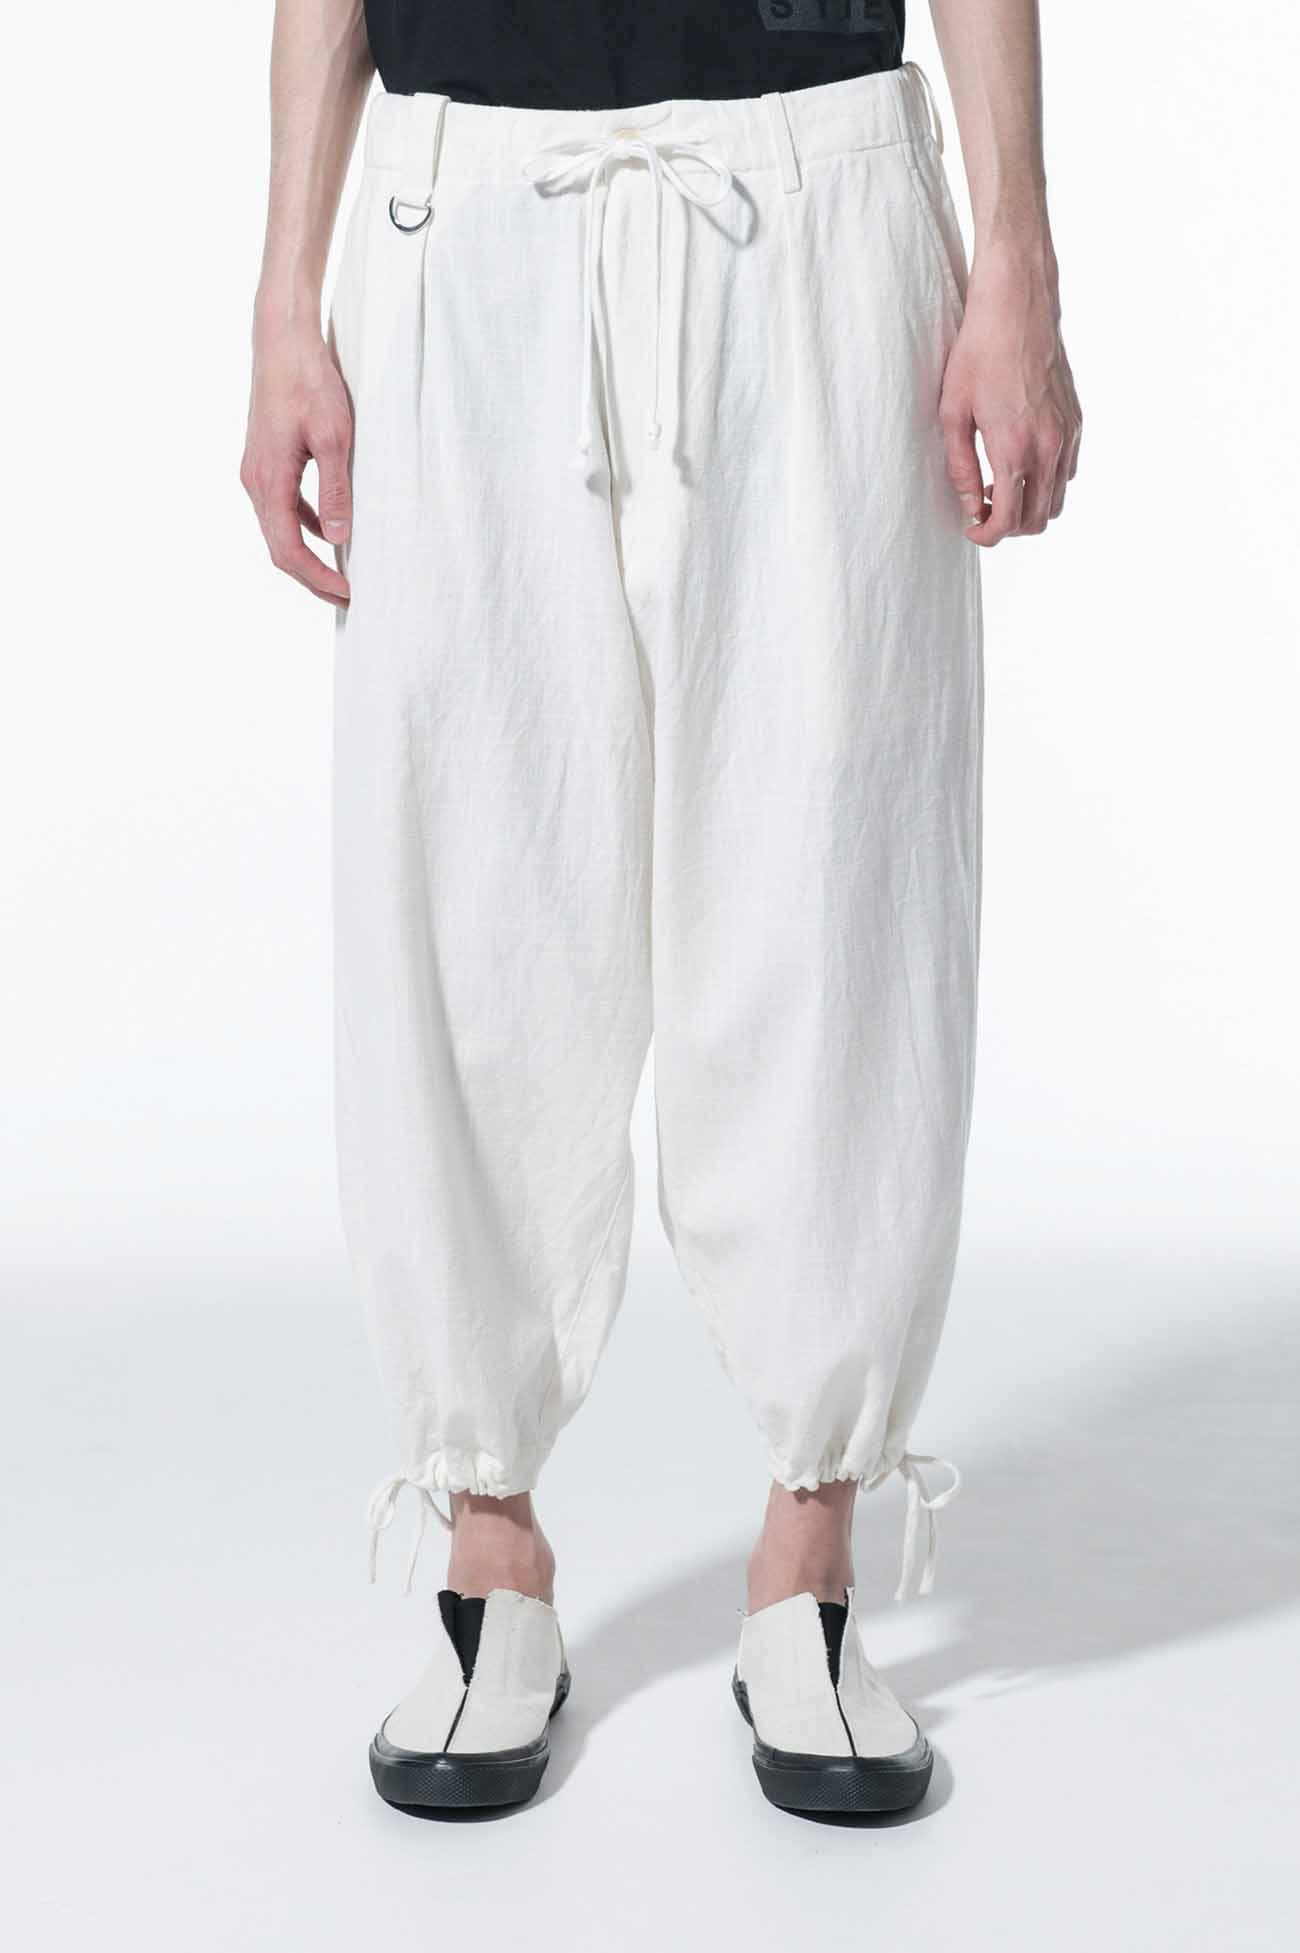 Indian Kadi One Tuck Draw String Pants